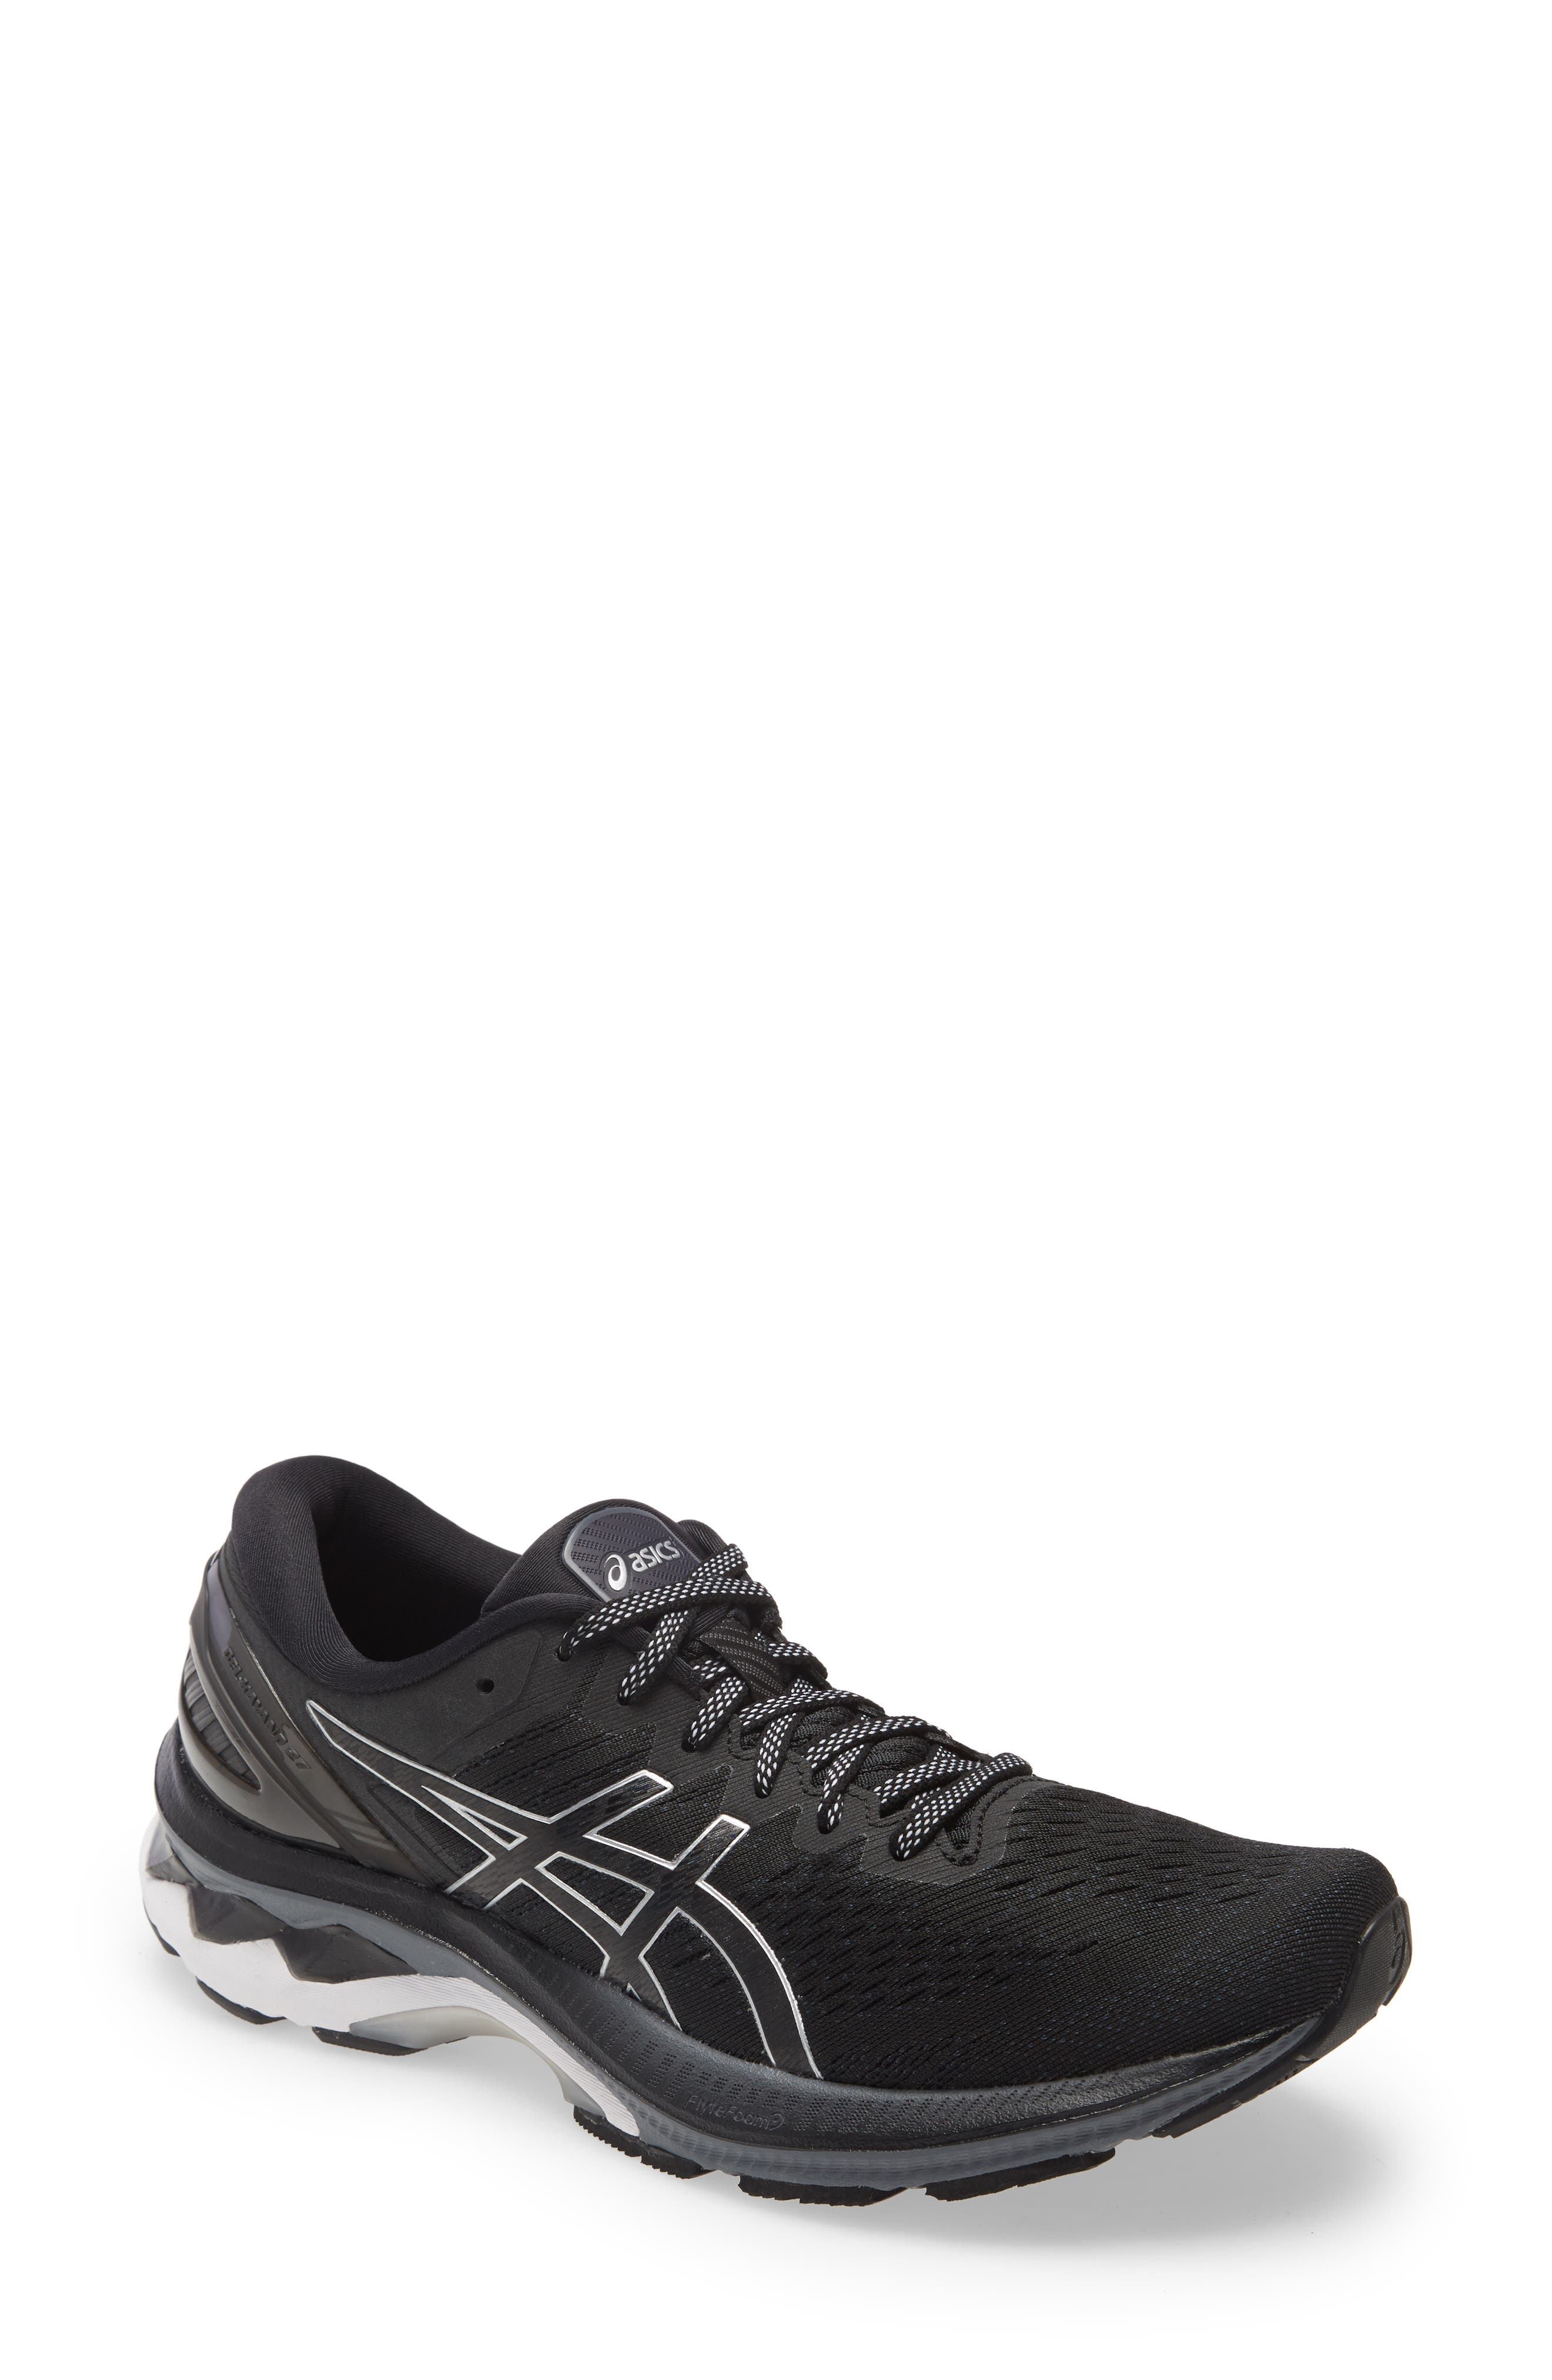 Women's Asics Gel-Kayano 26 Running Shoe